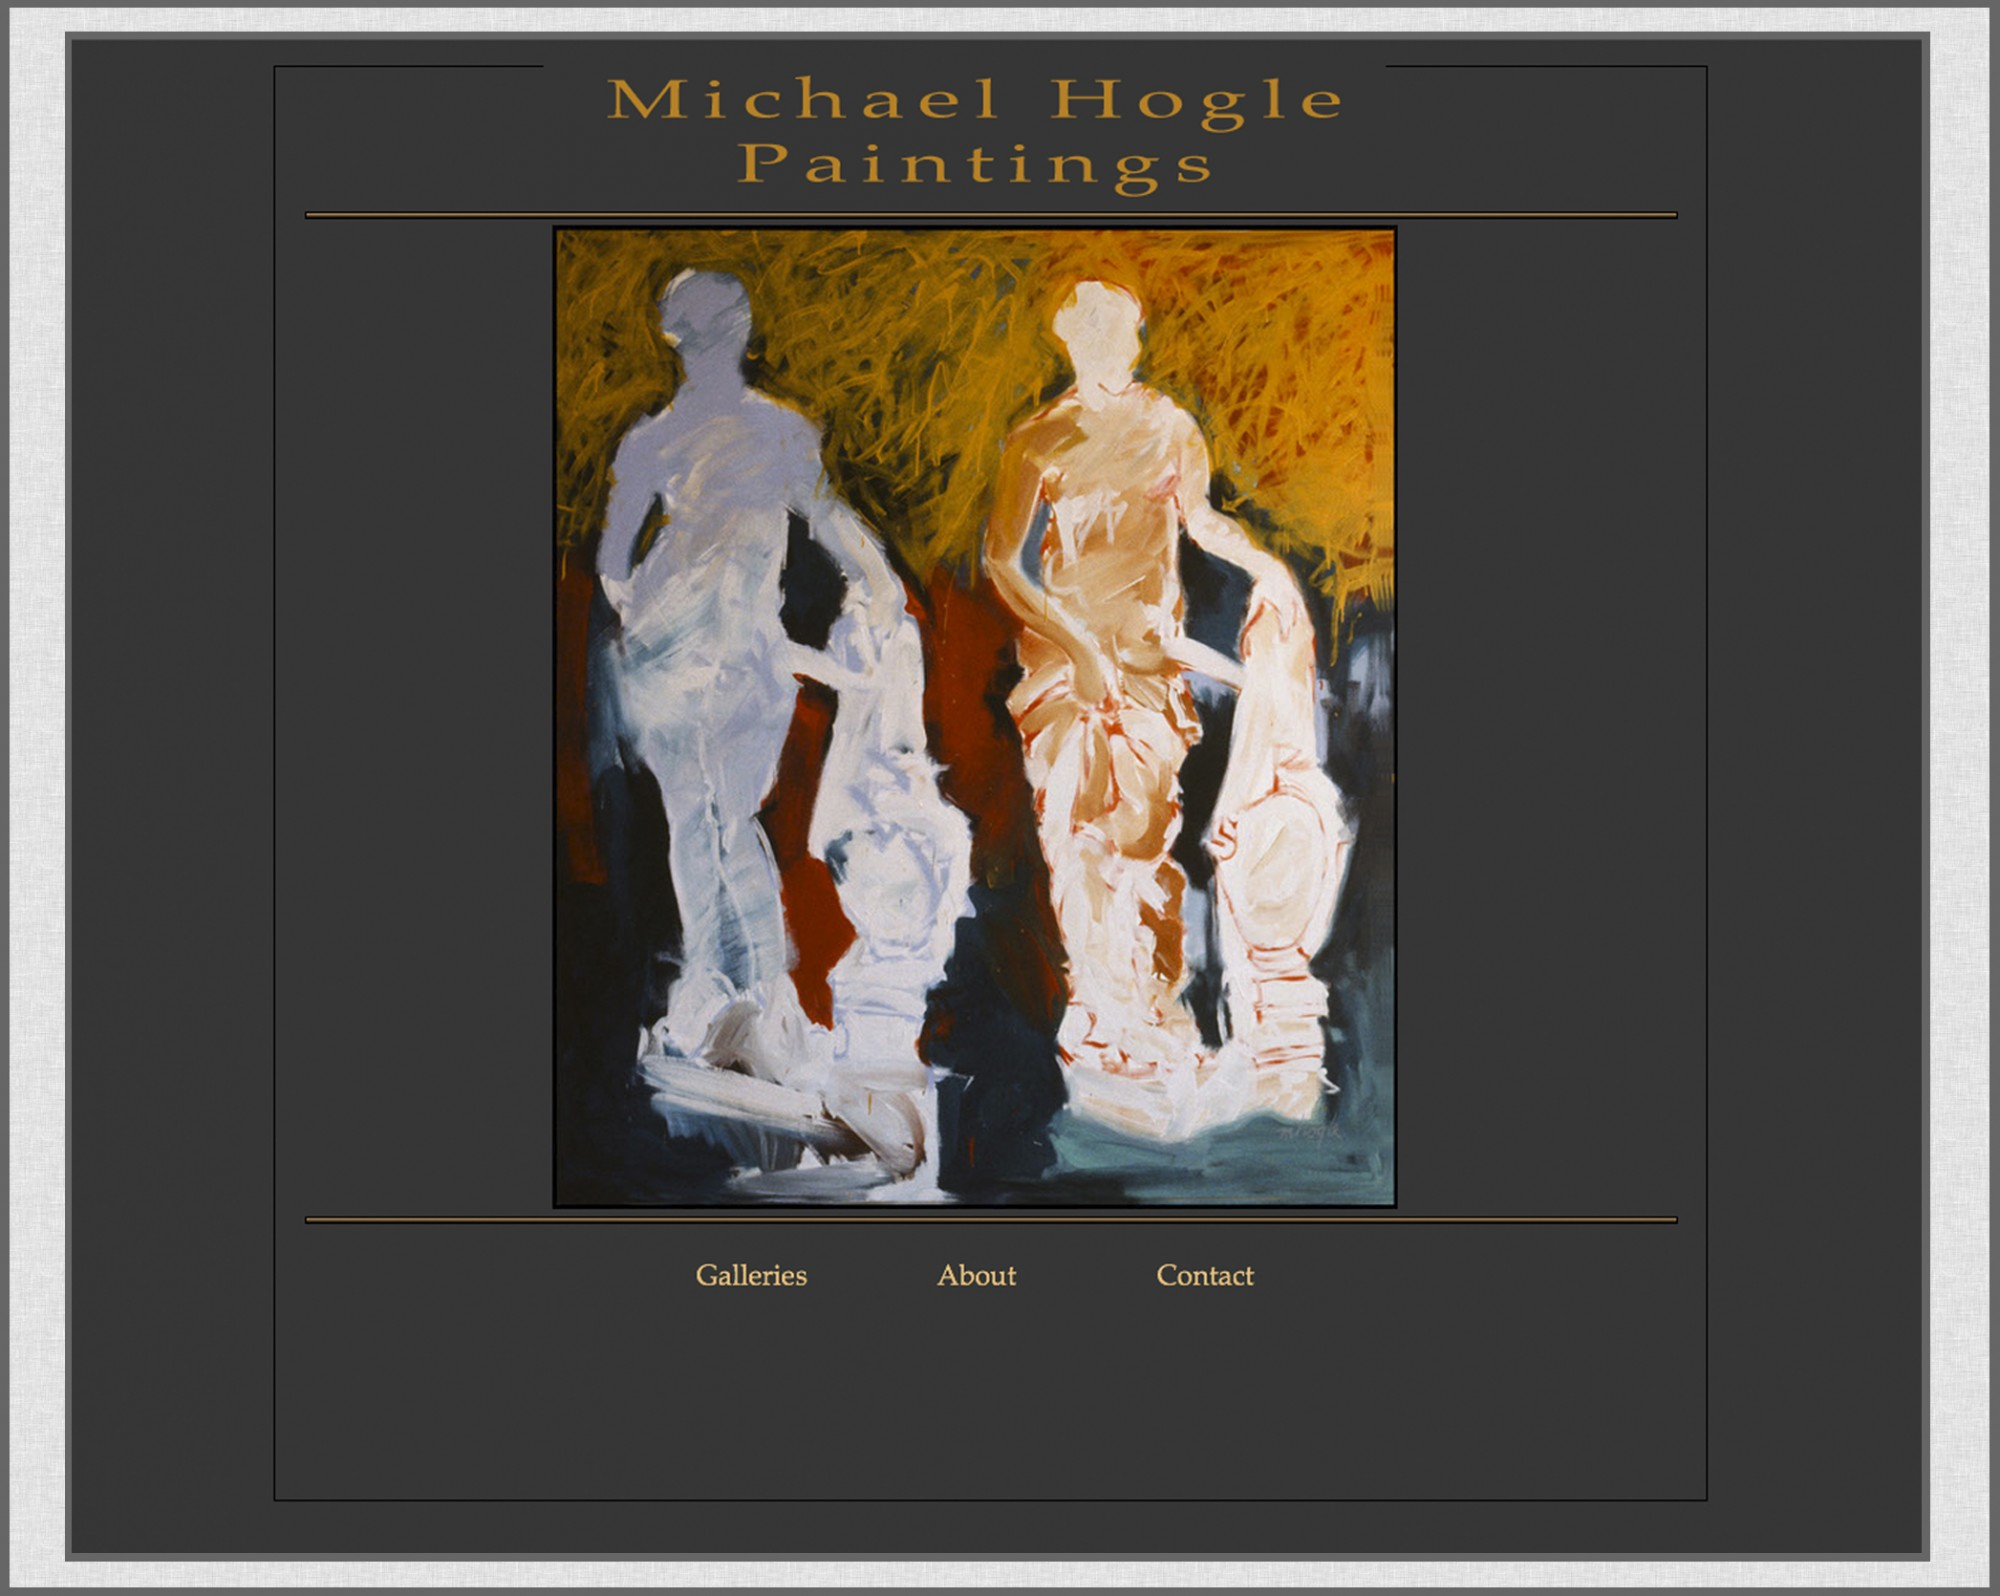 home page of michaelhogle.com